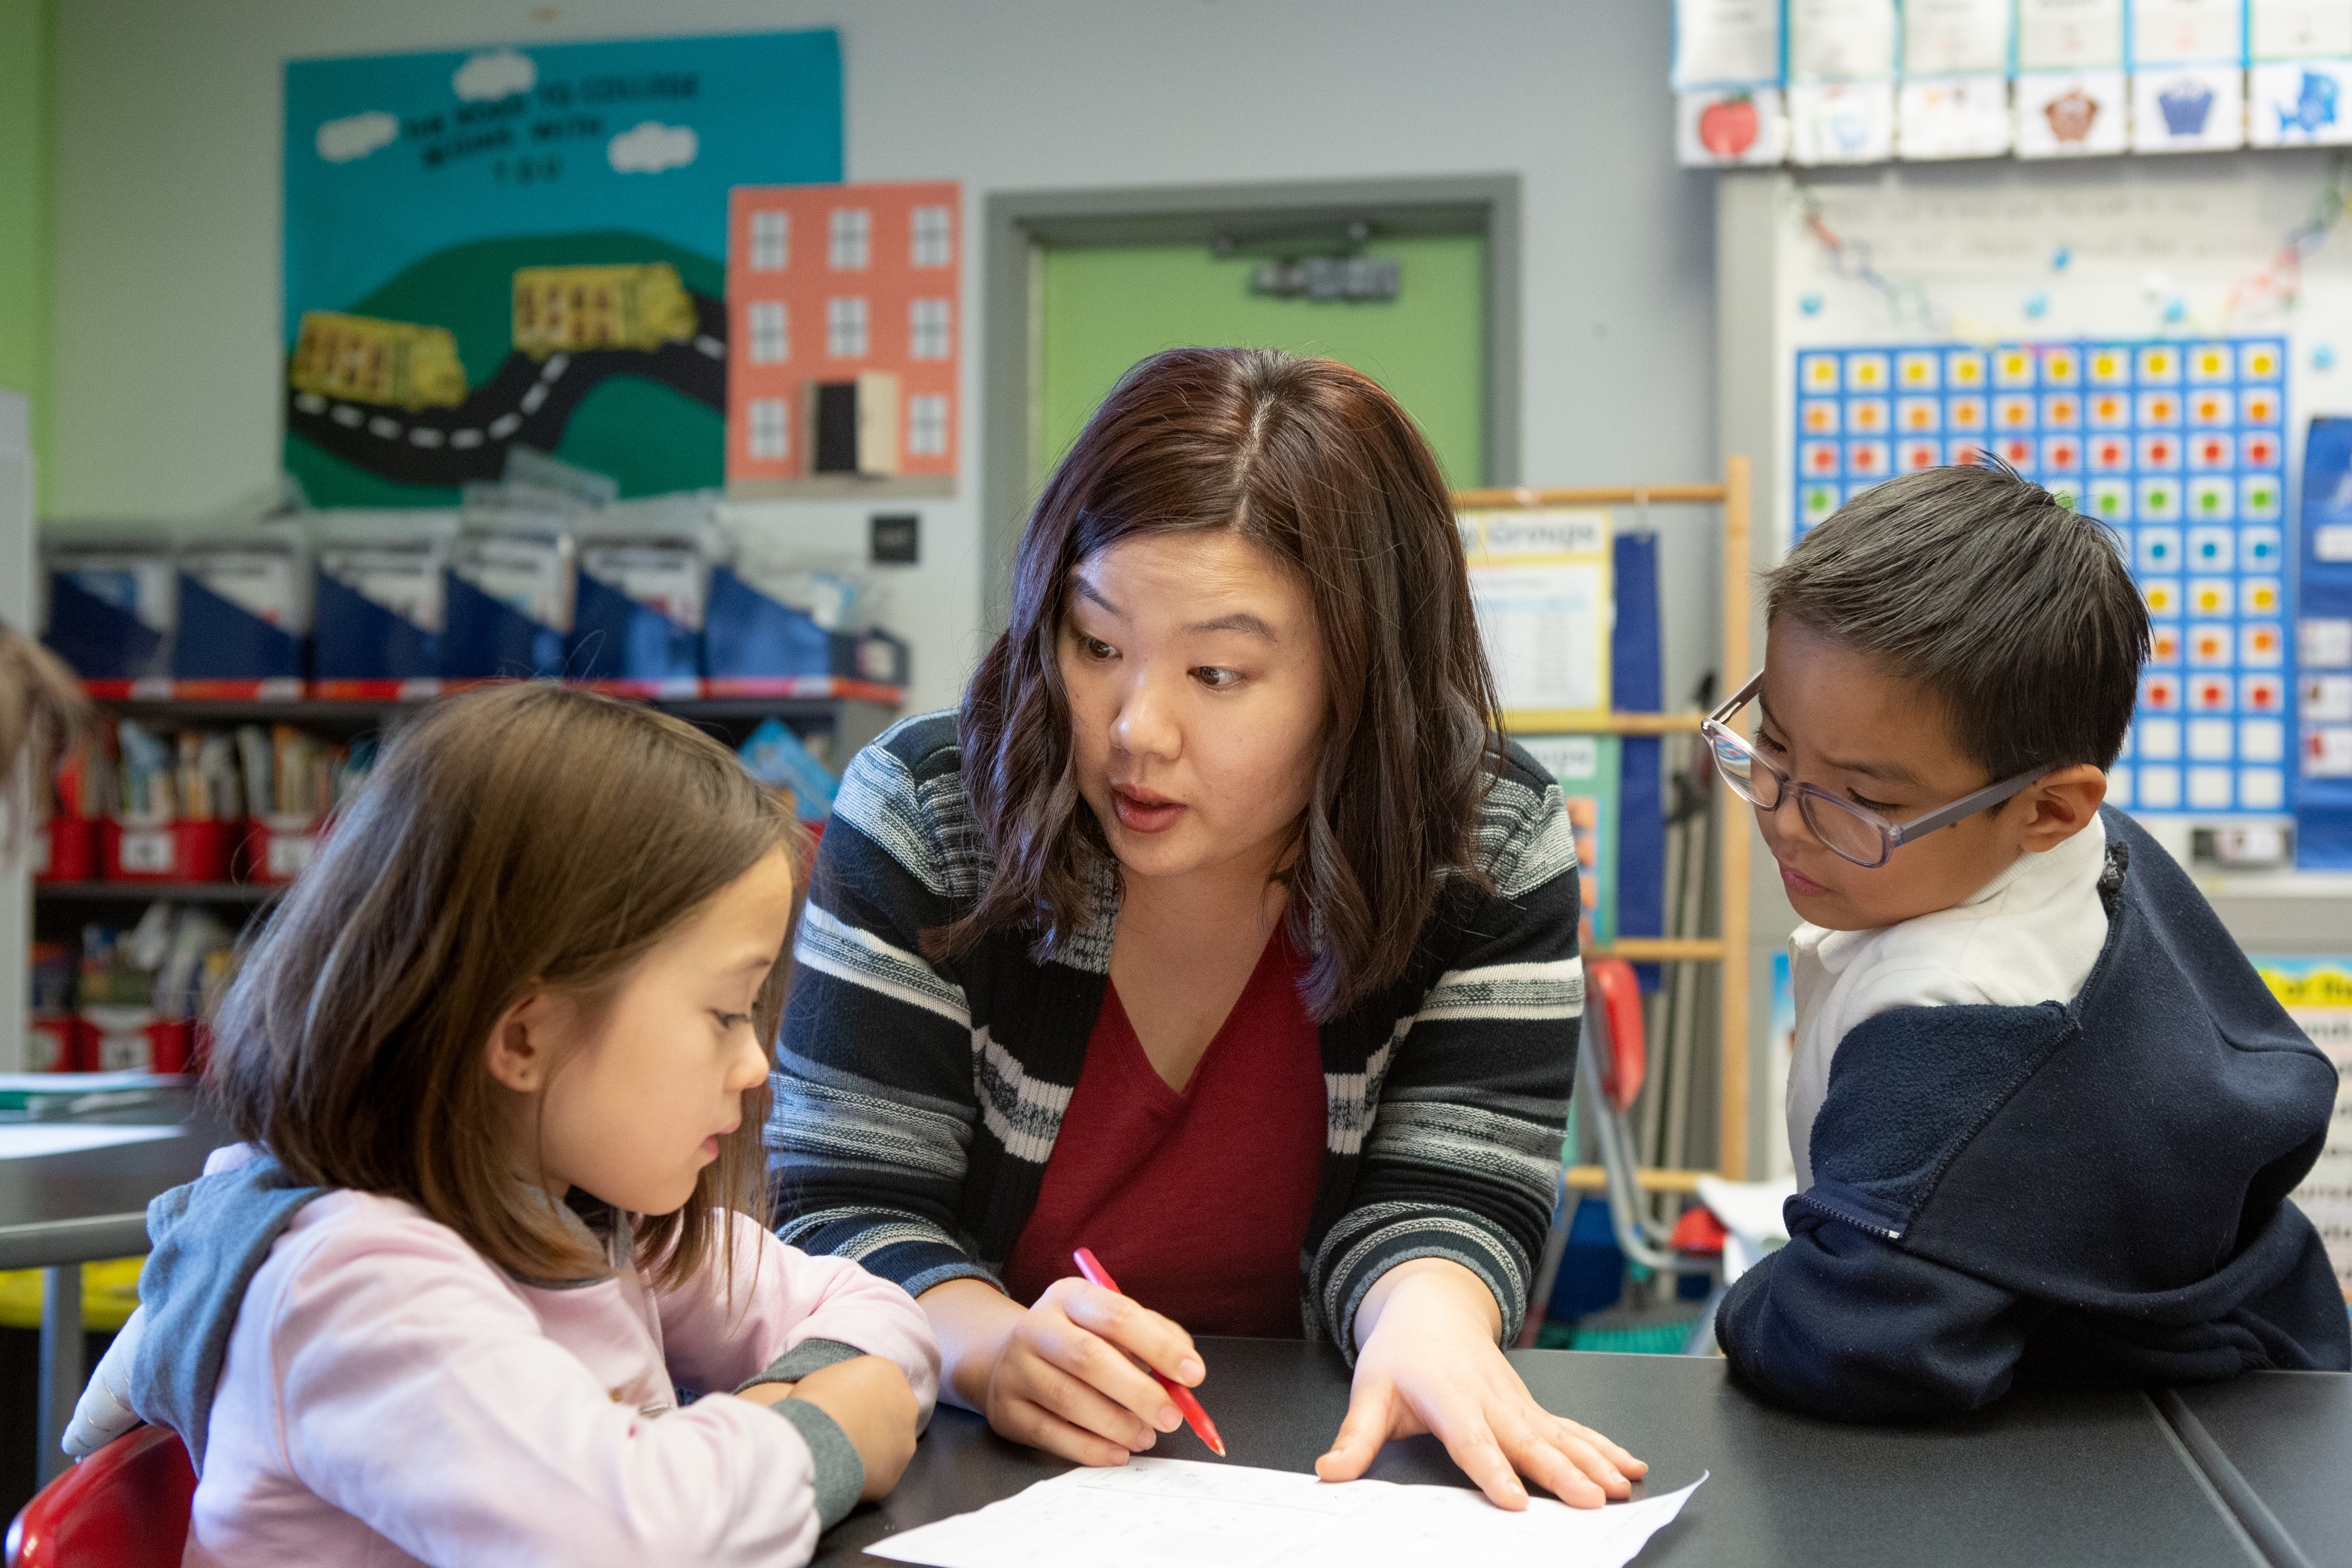 A kindergarten teacher helps a girl and boy with a class activity.